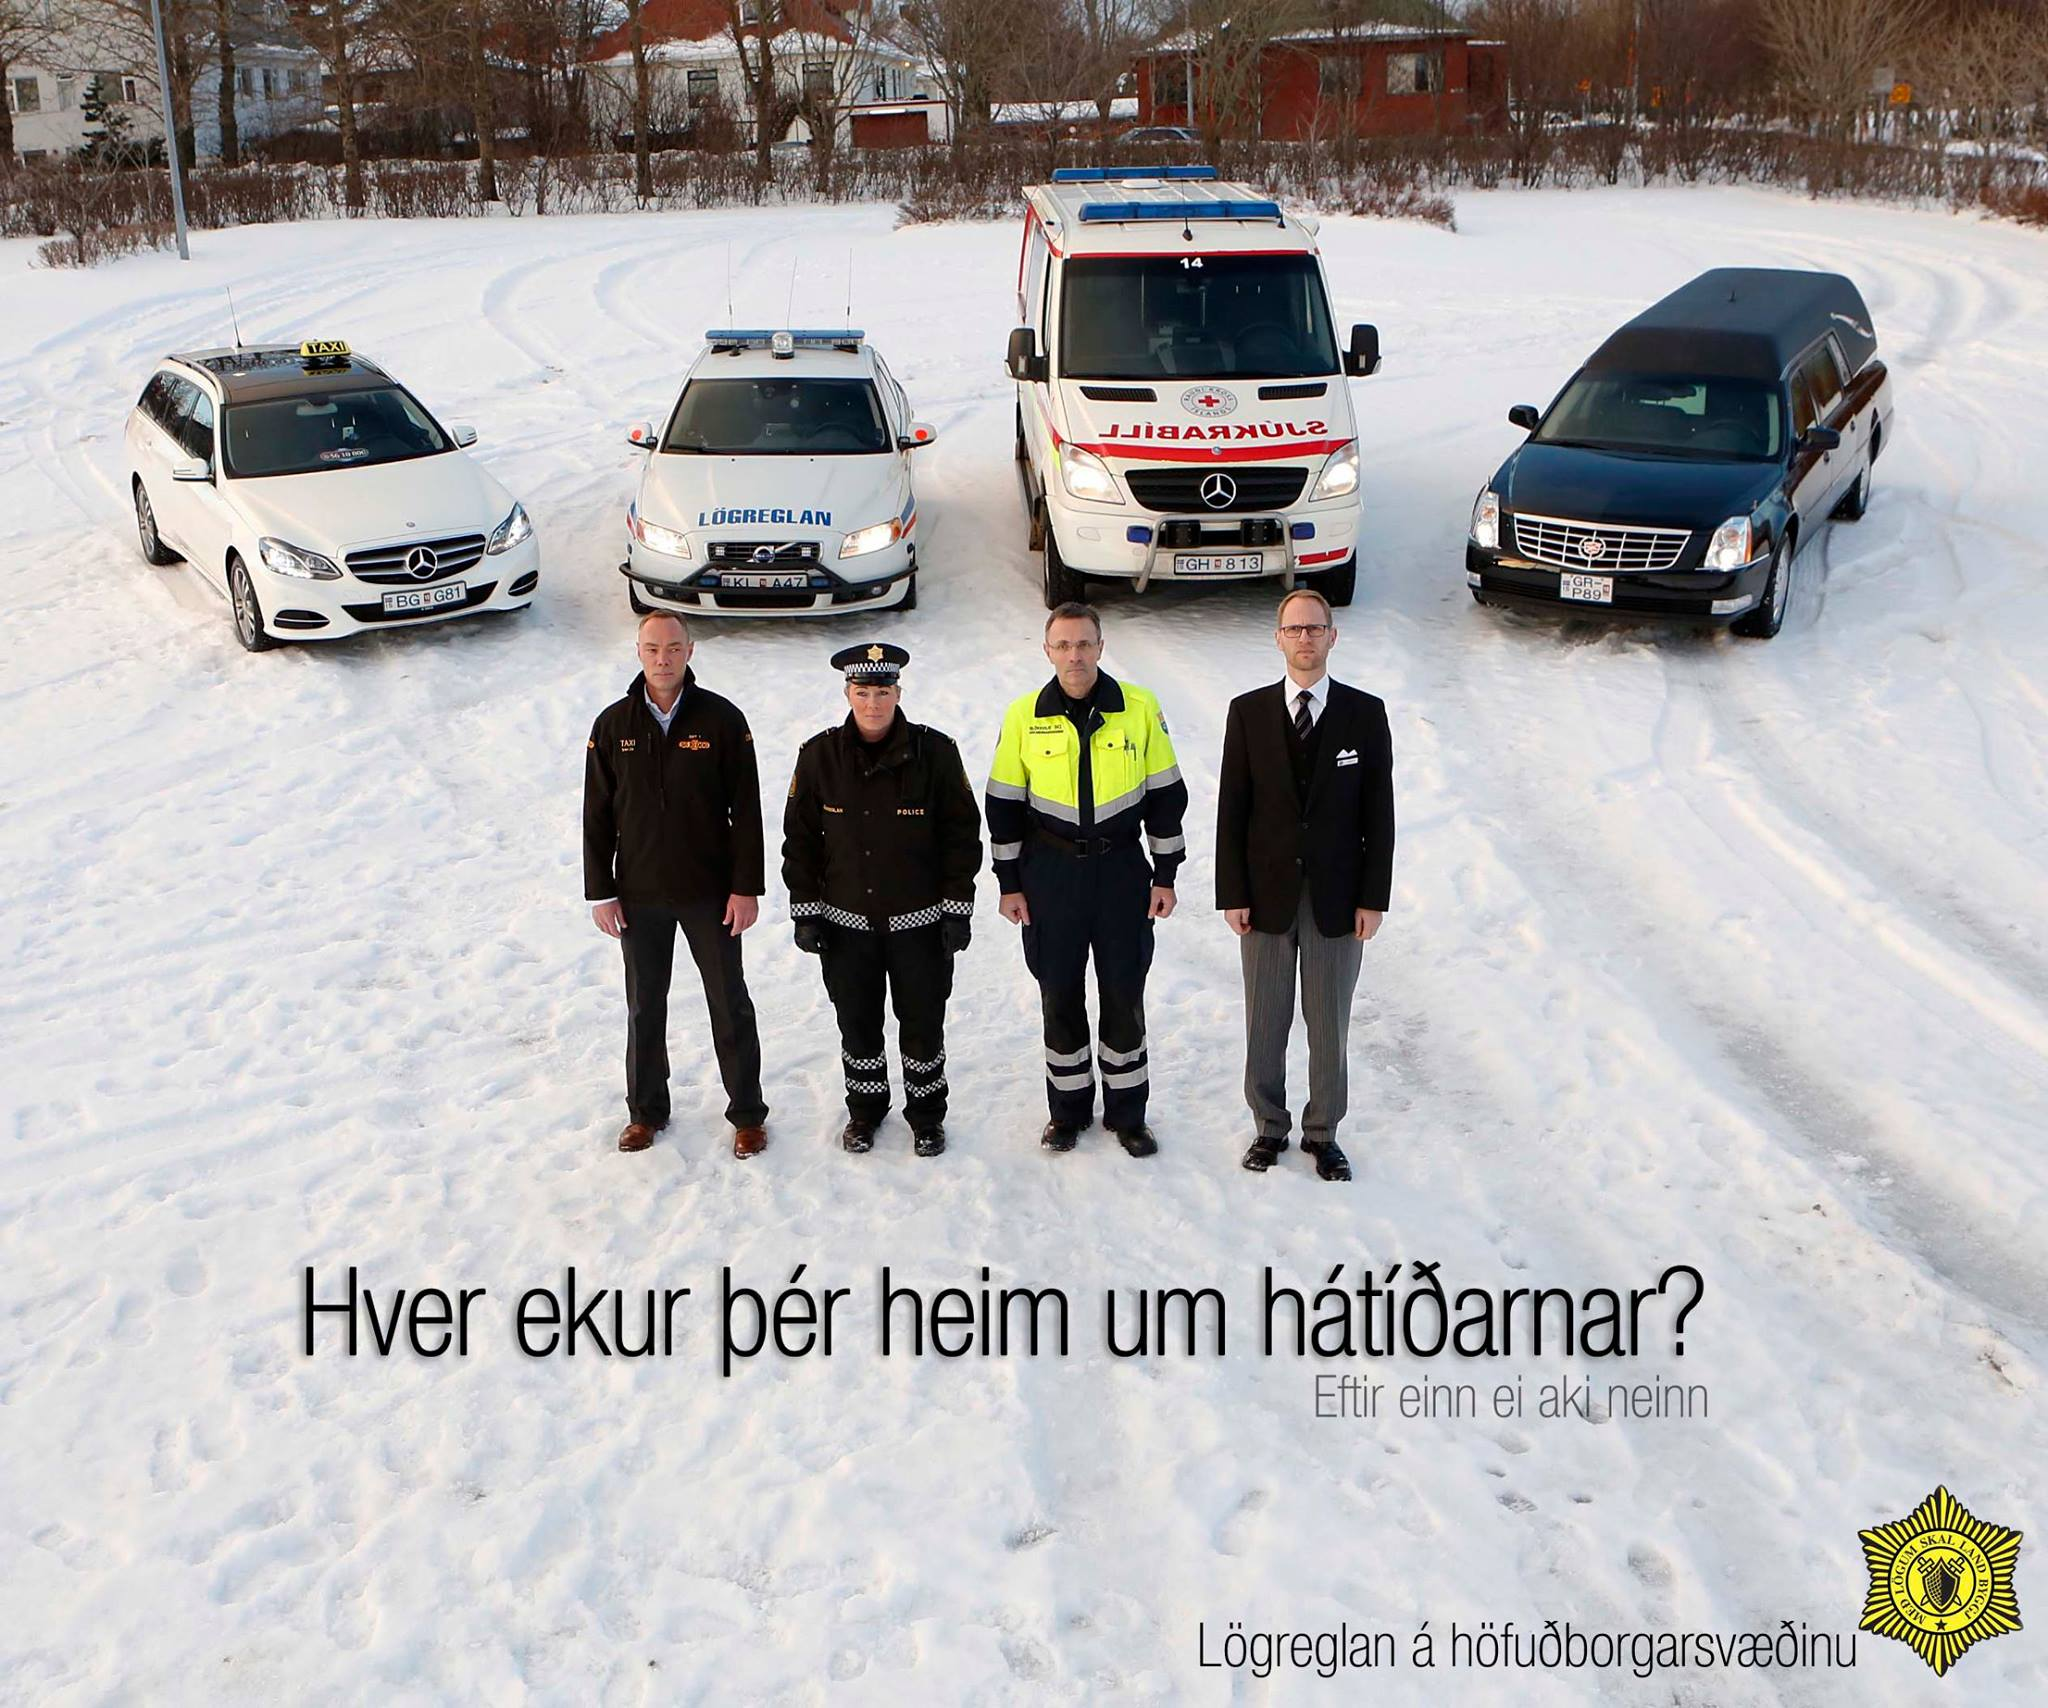 Reykjavik police ads